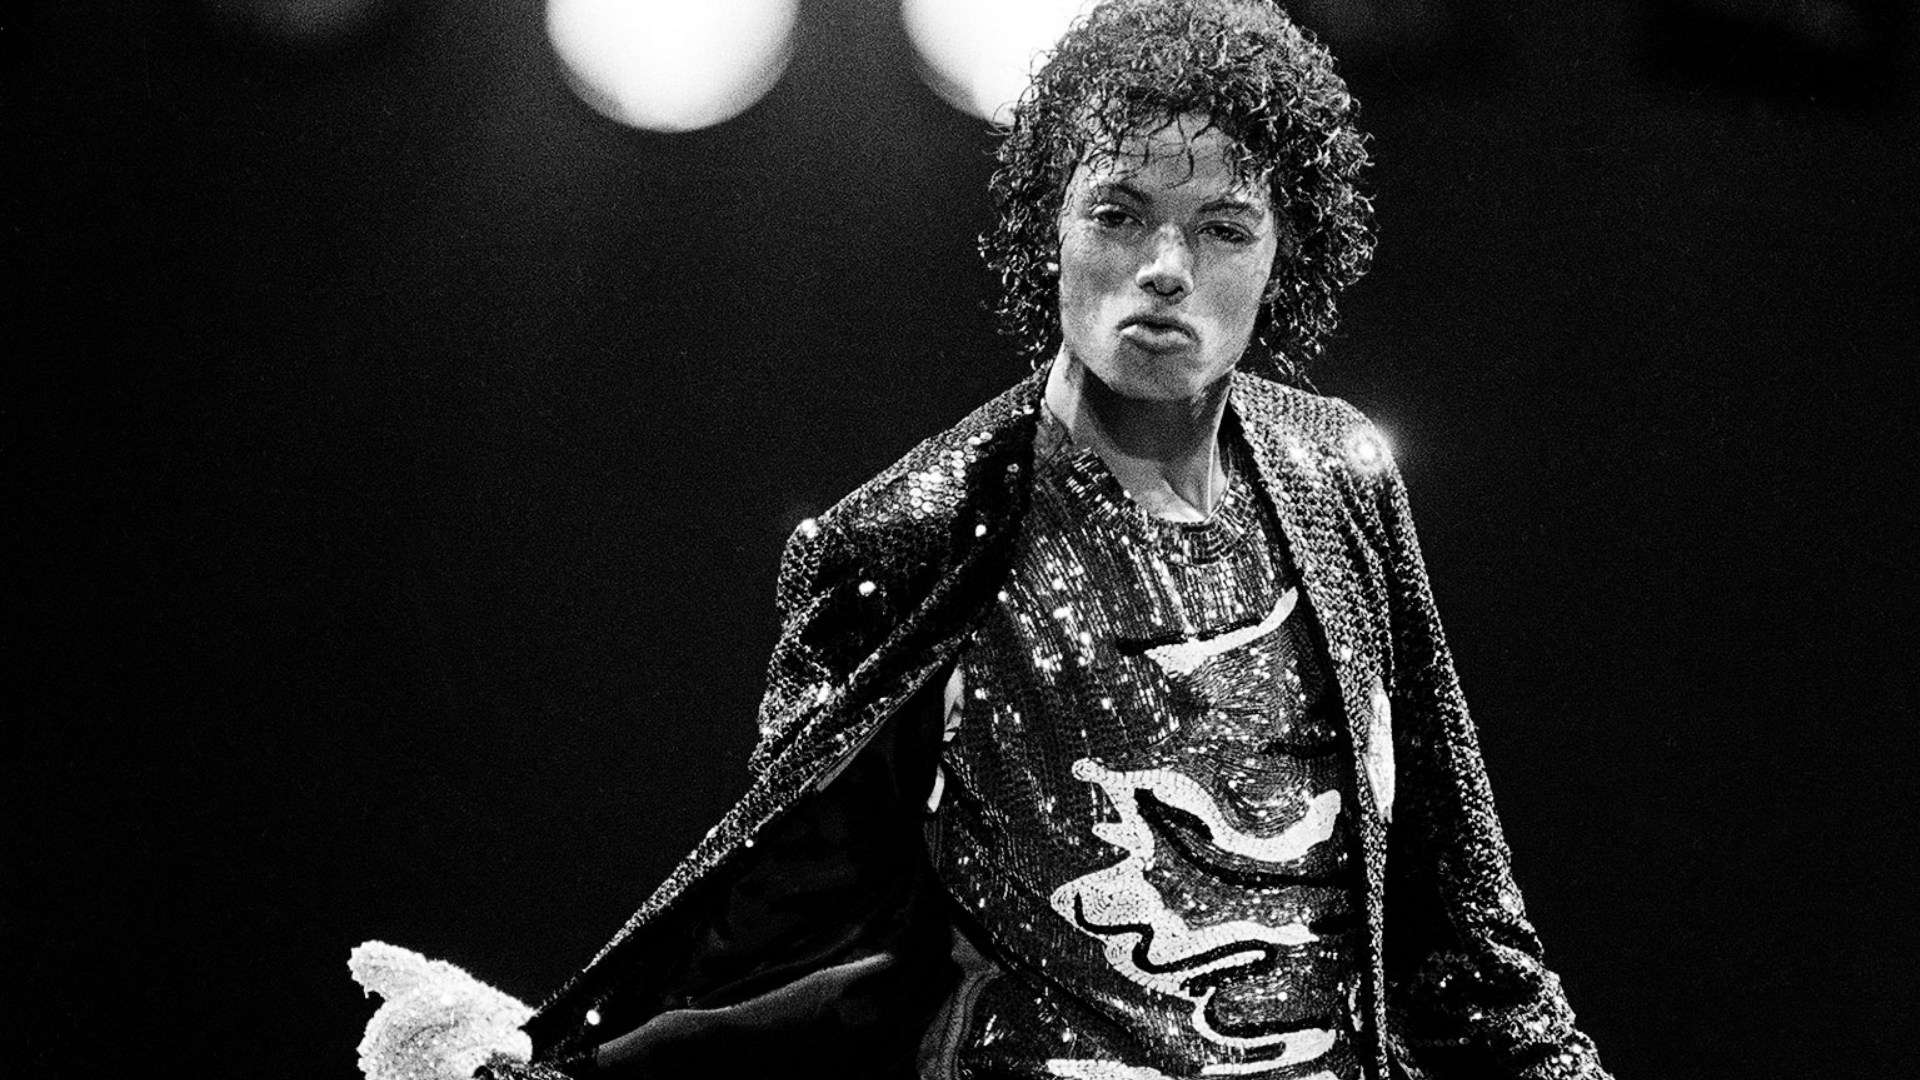 Michael Jackson Wallpaper 007